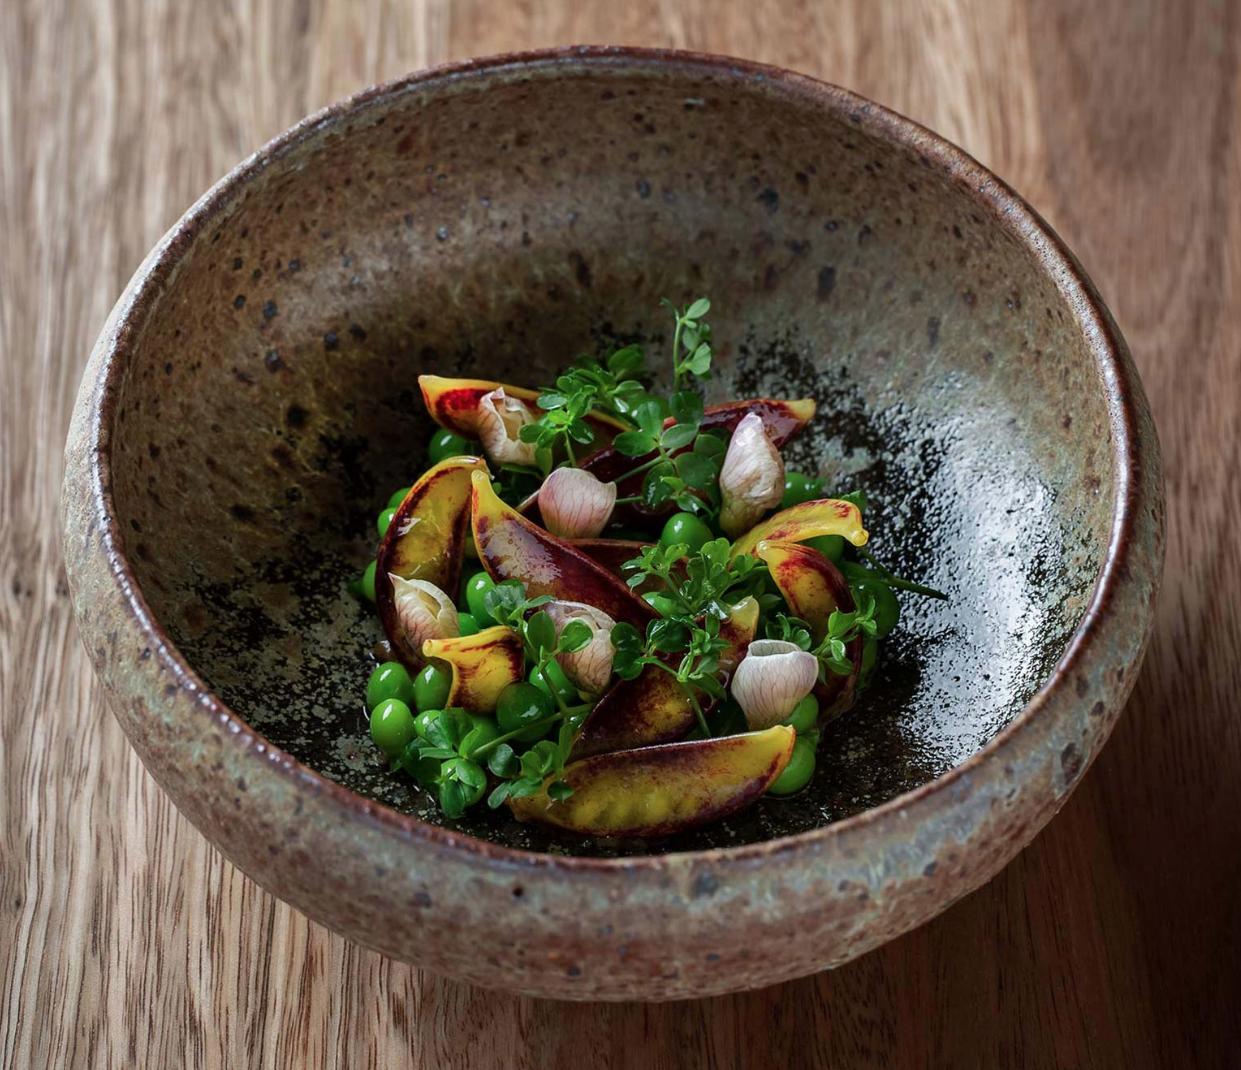 Quay The 8 Best Restaurants in Australia